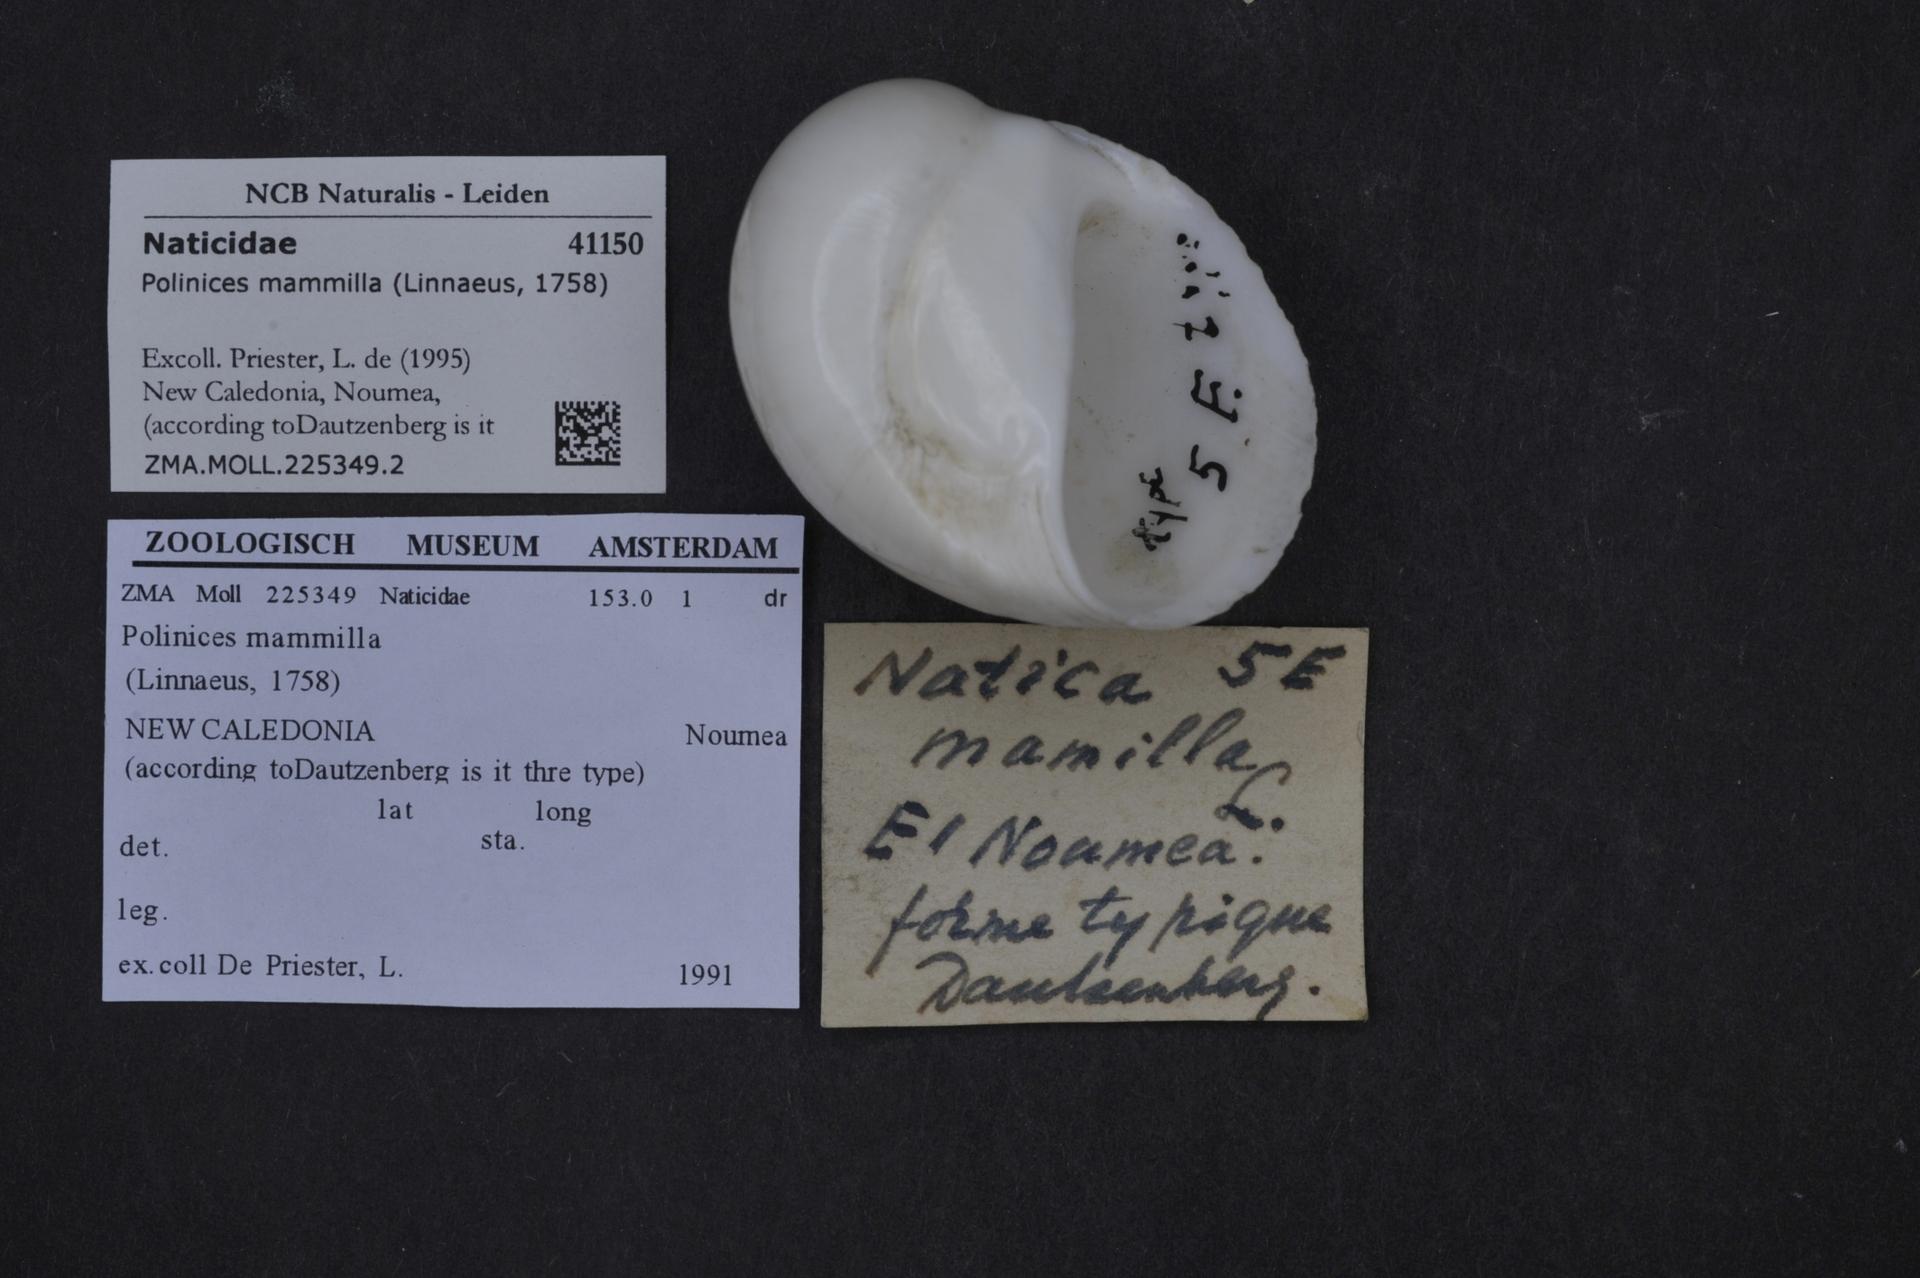 ZMA.MOLL.225349.2 | Polinices mammilla (Linnaeus, 1758)